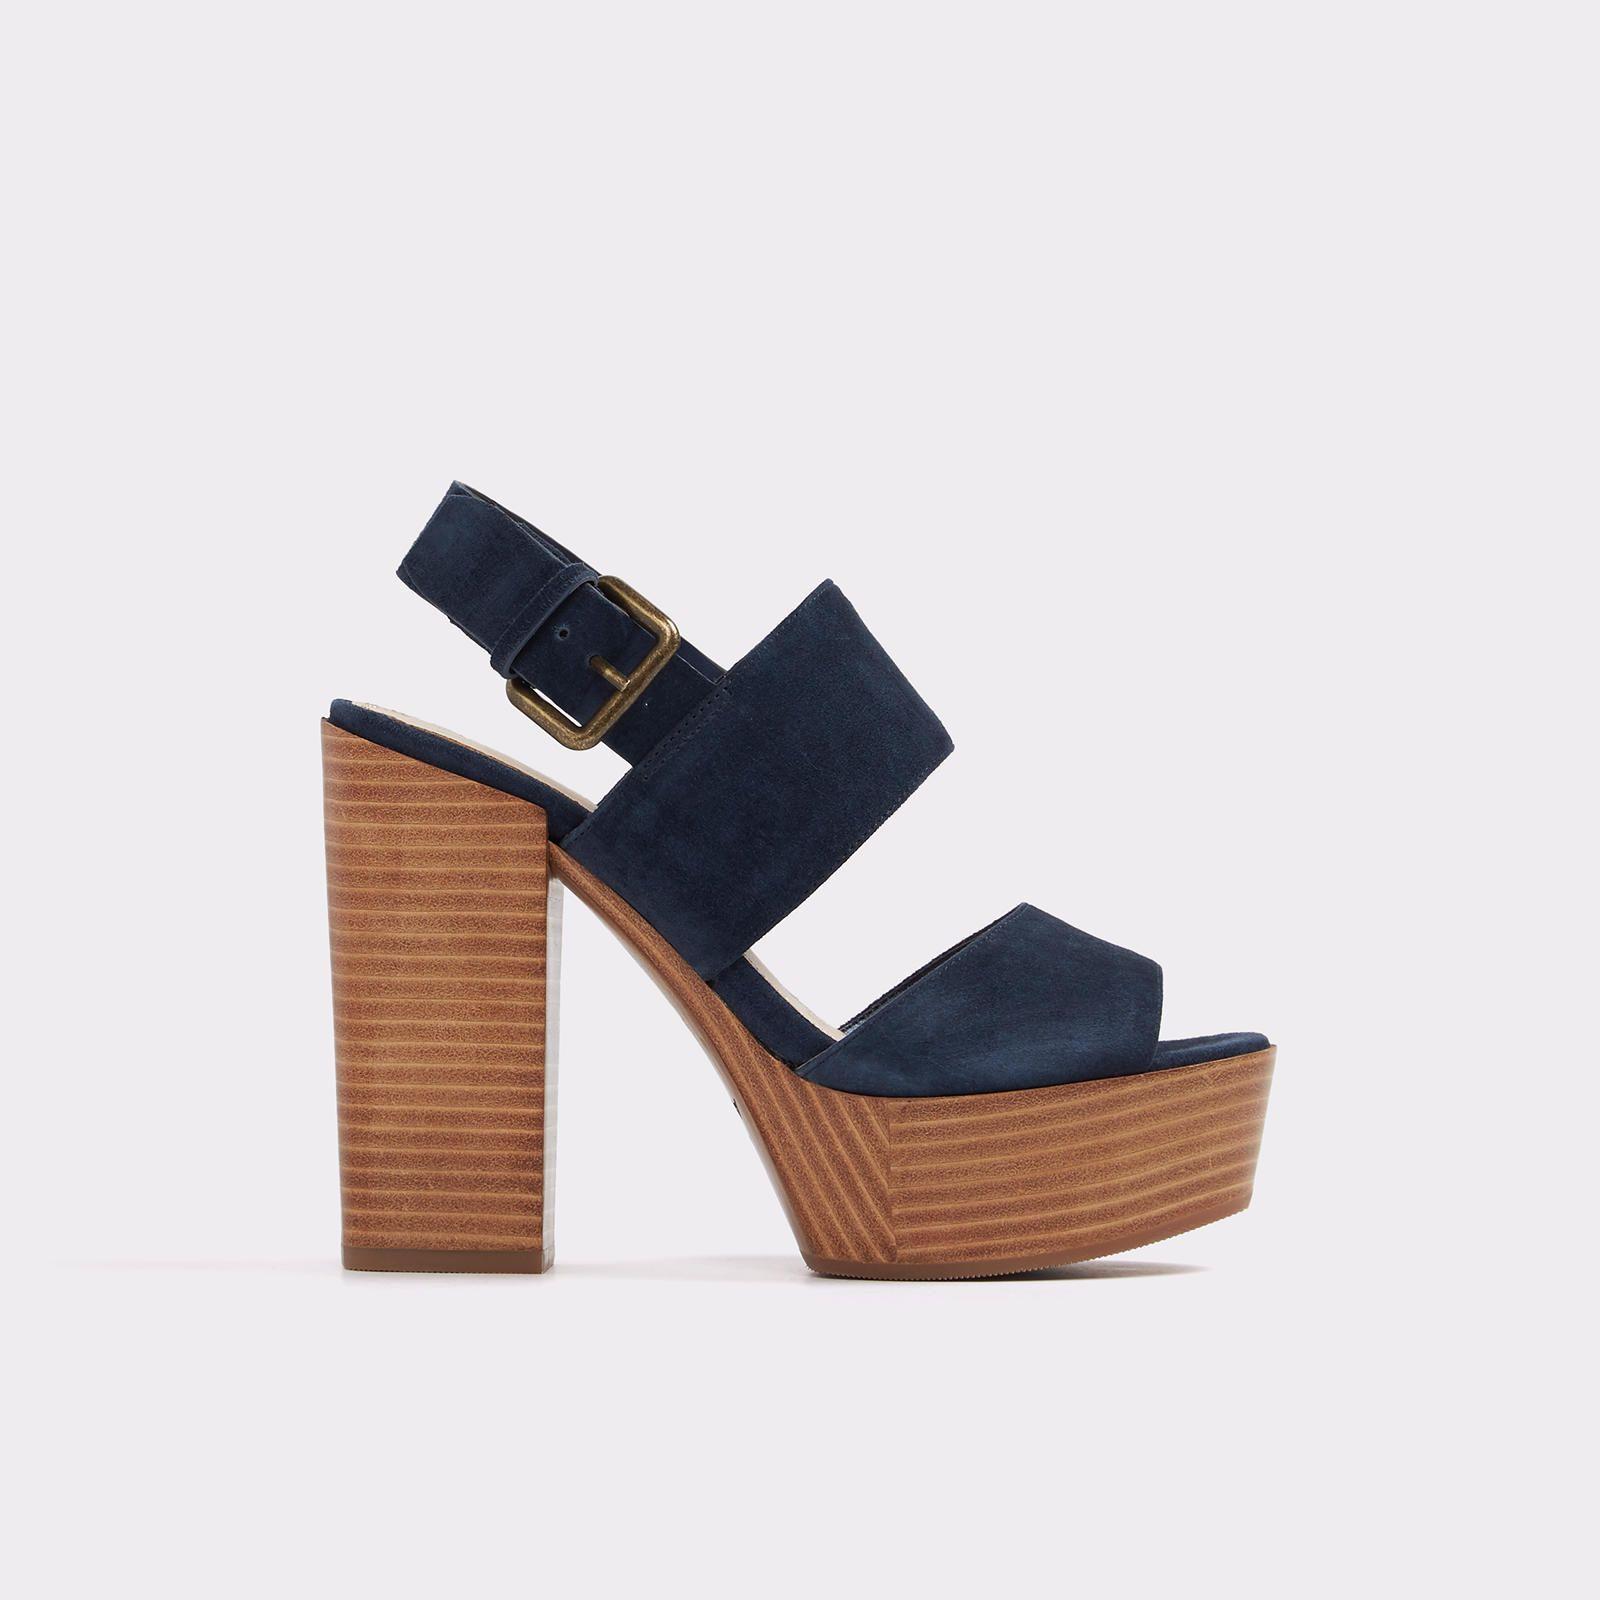 62ea4dfdc4 Maximoa | Curvy Girl Shoes | Heels, Shoes, Heeled mules